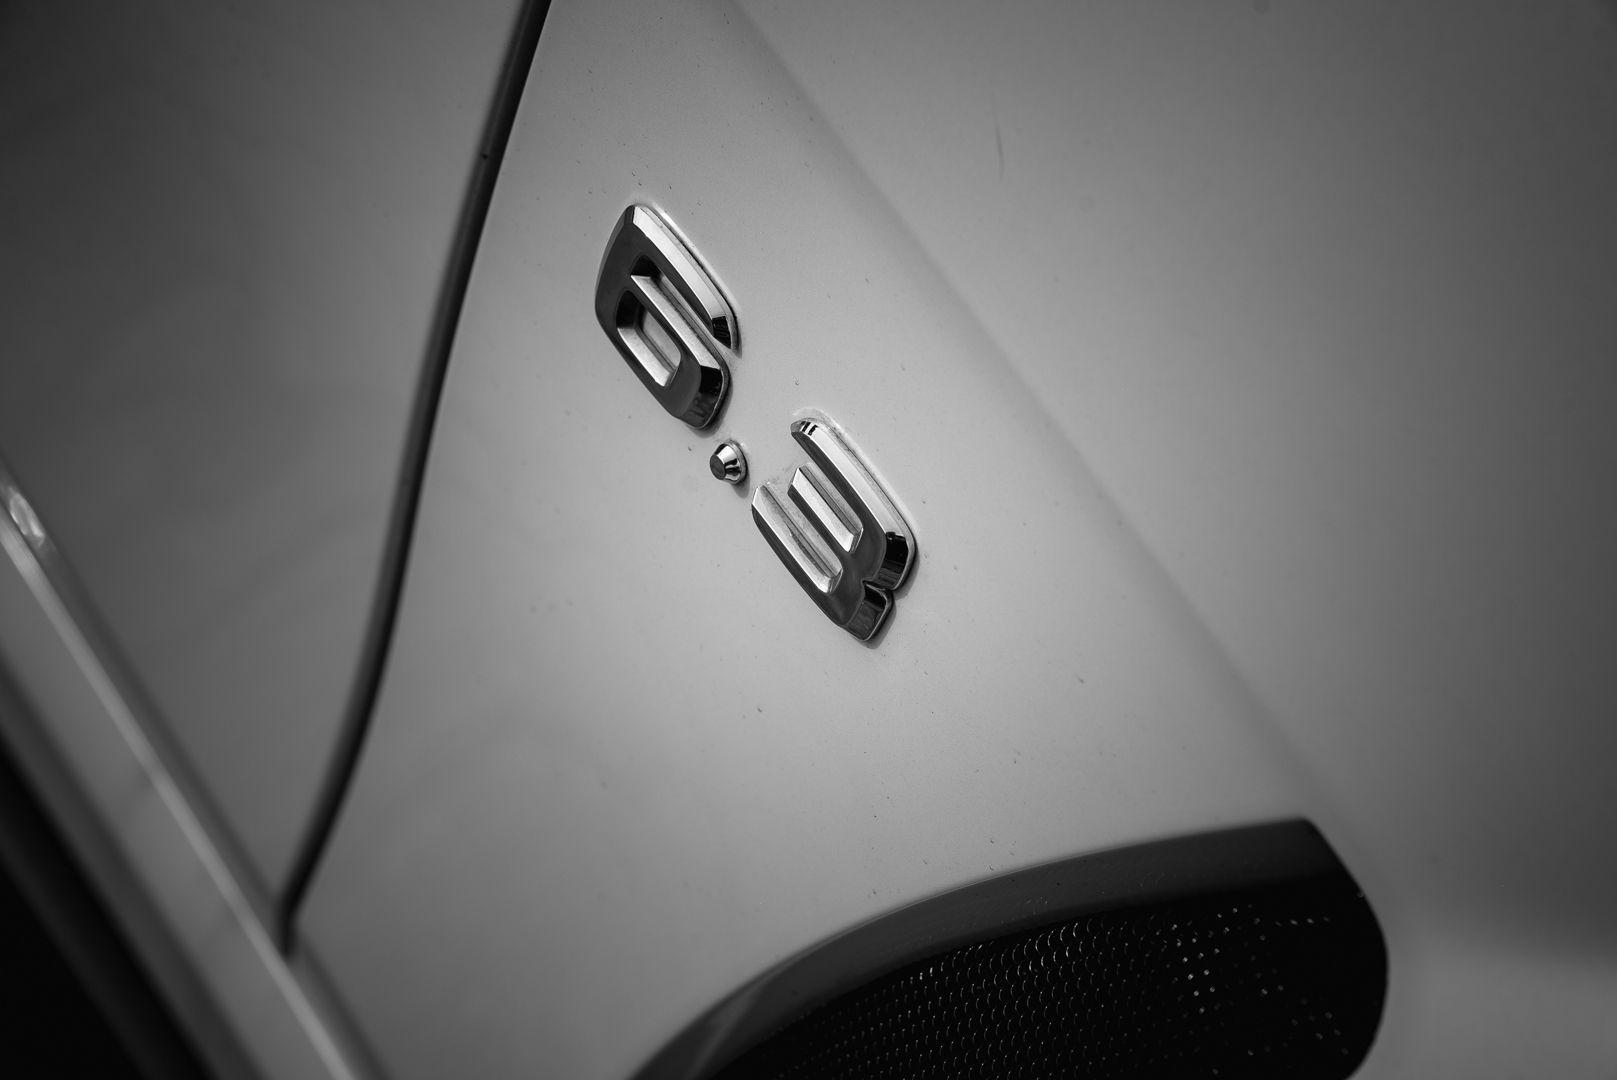 2012 Mercedes-Benz C63 AMG Black Series 71781